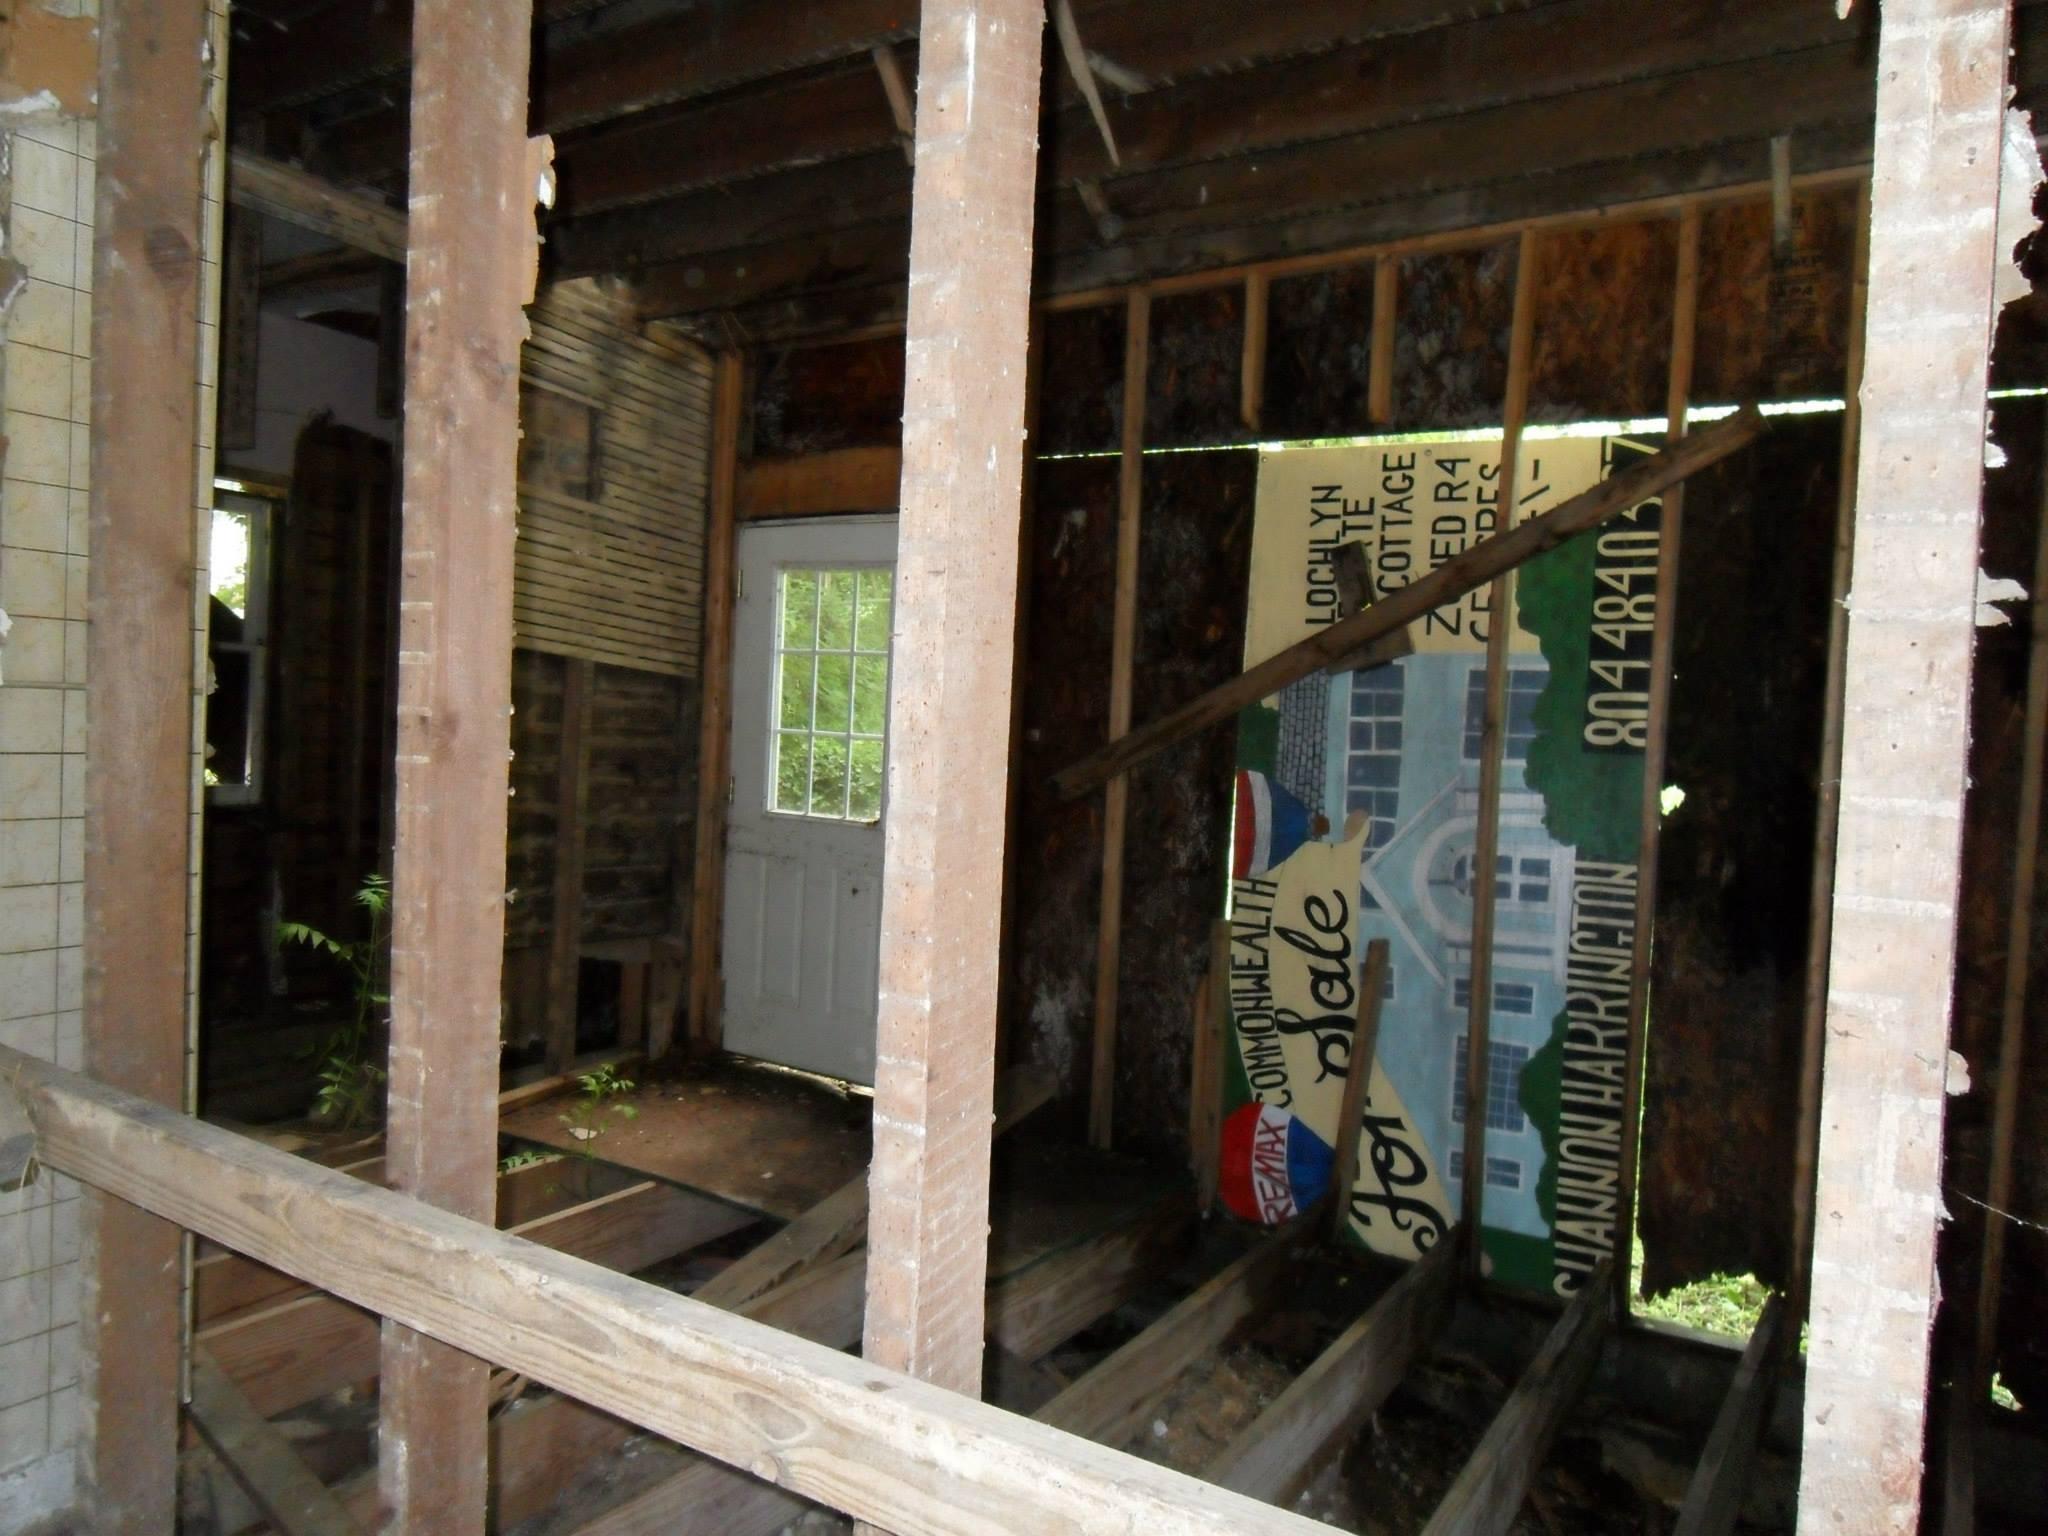 619 frederick st before renovation - door to backyard